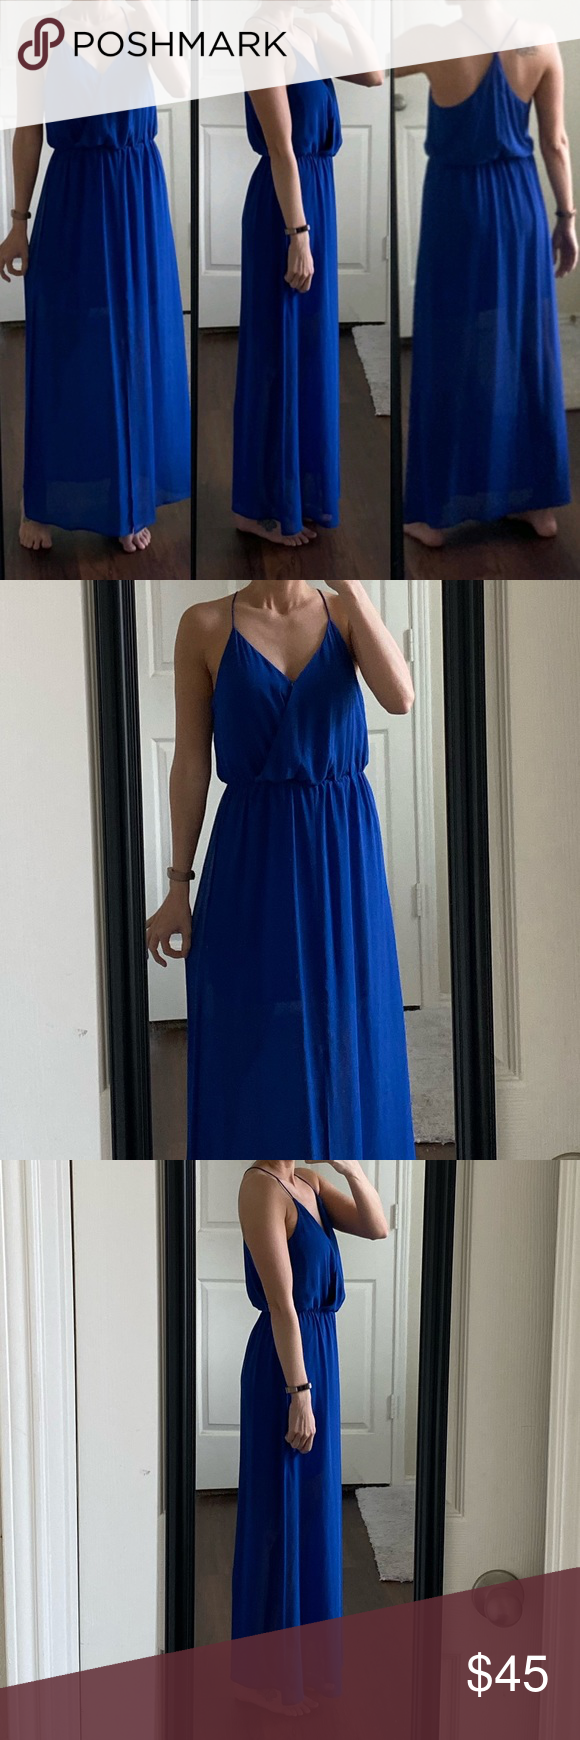 Vince Camuto Royal Blue Maxi Dress Royal Blue Maxi Dress Maxi Dress Blue Clothes Design [ 1740 x 580 Pixel ]